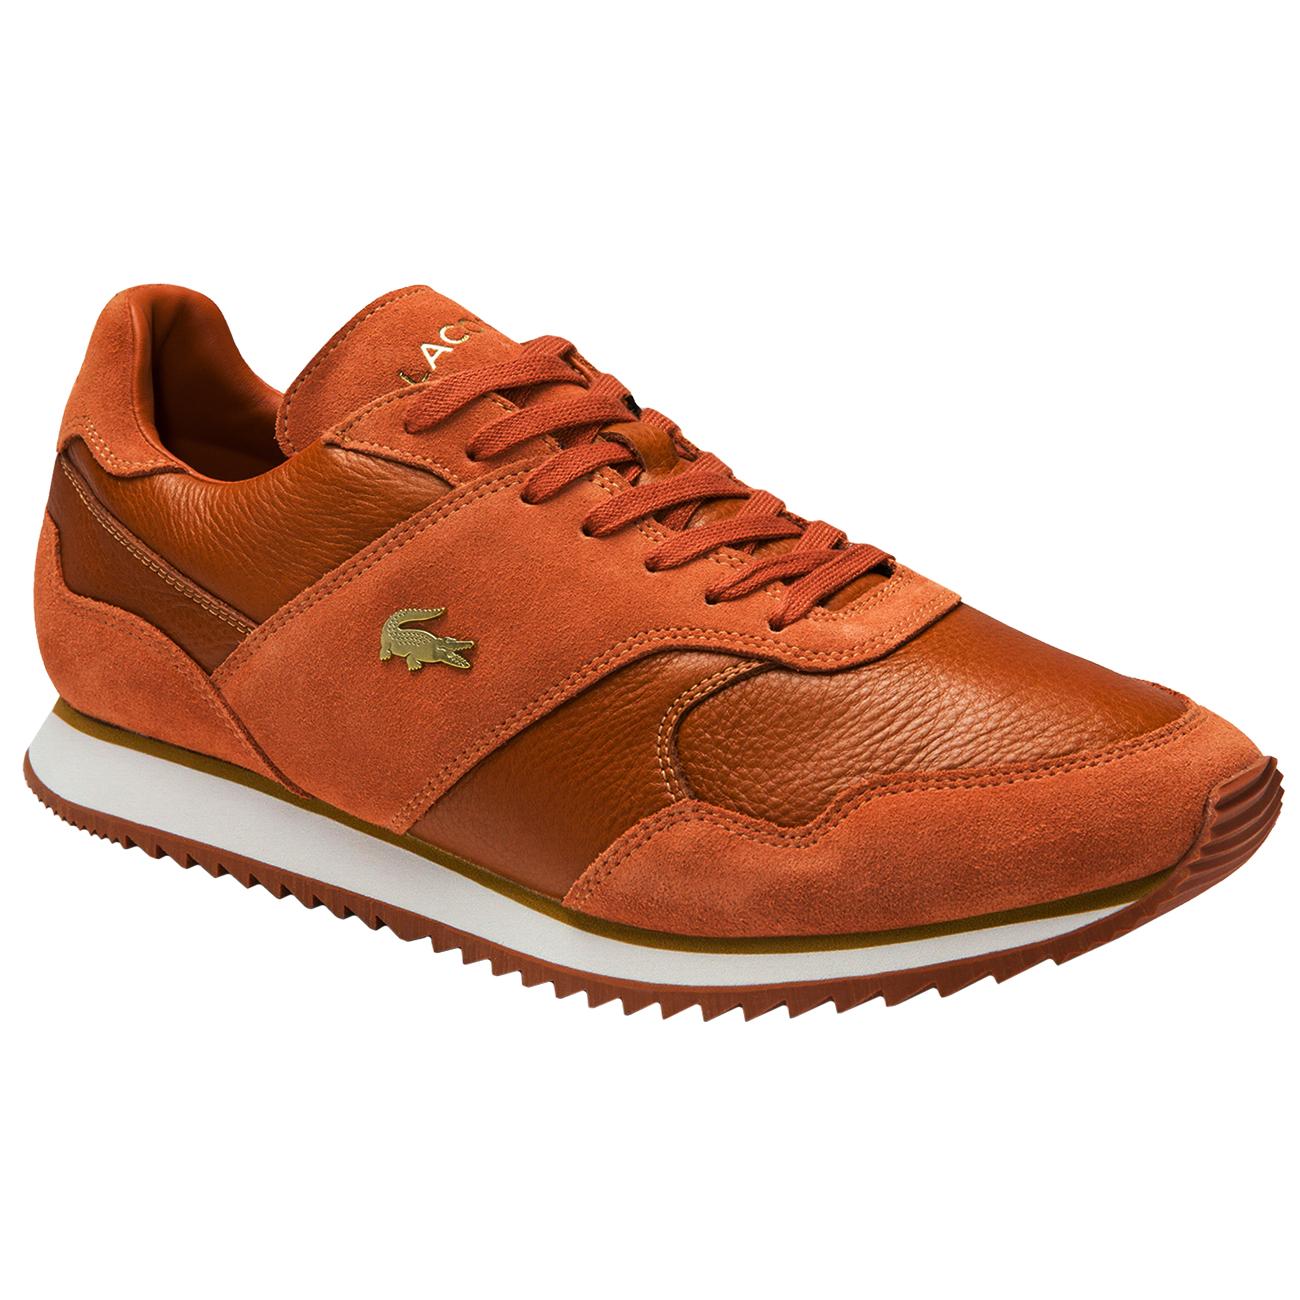 Lacoste Aesthet Luxe Sneaker braun weiß 7-40SMA00282A5